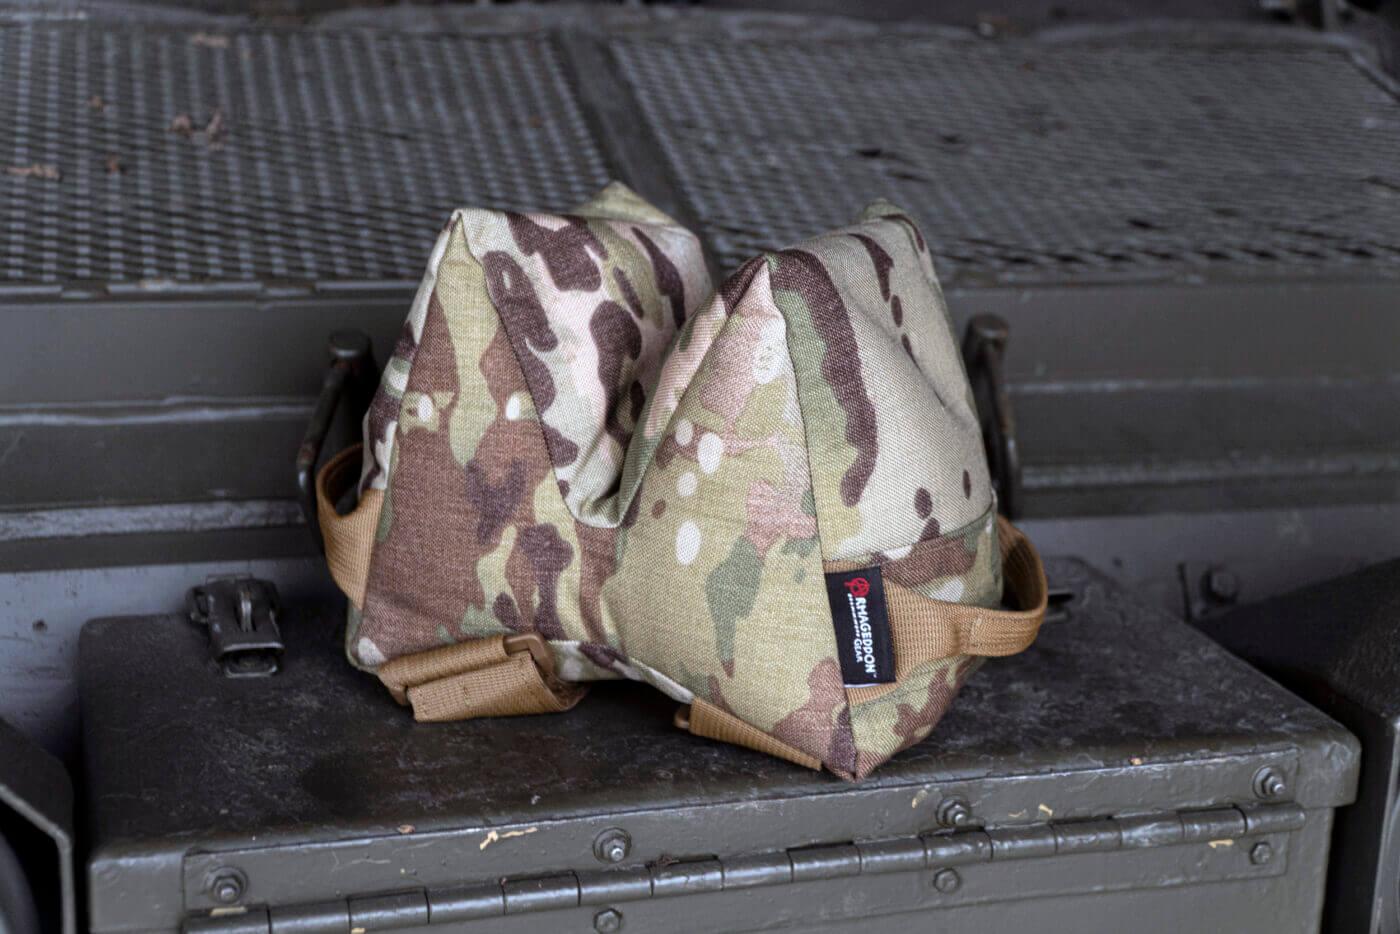 GameChanger Support Bag from Armageddon Gear